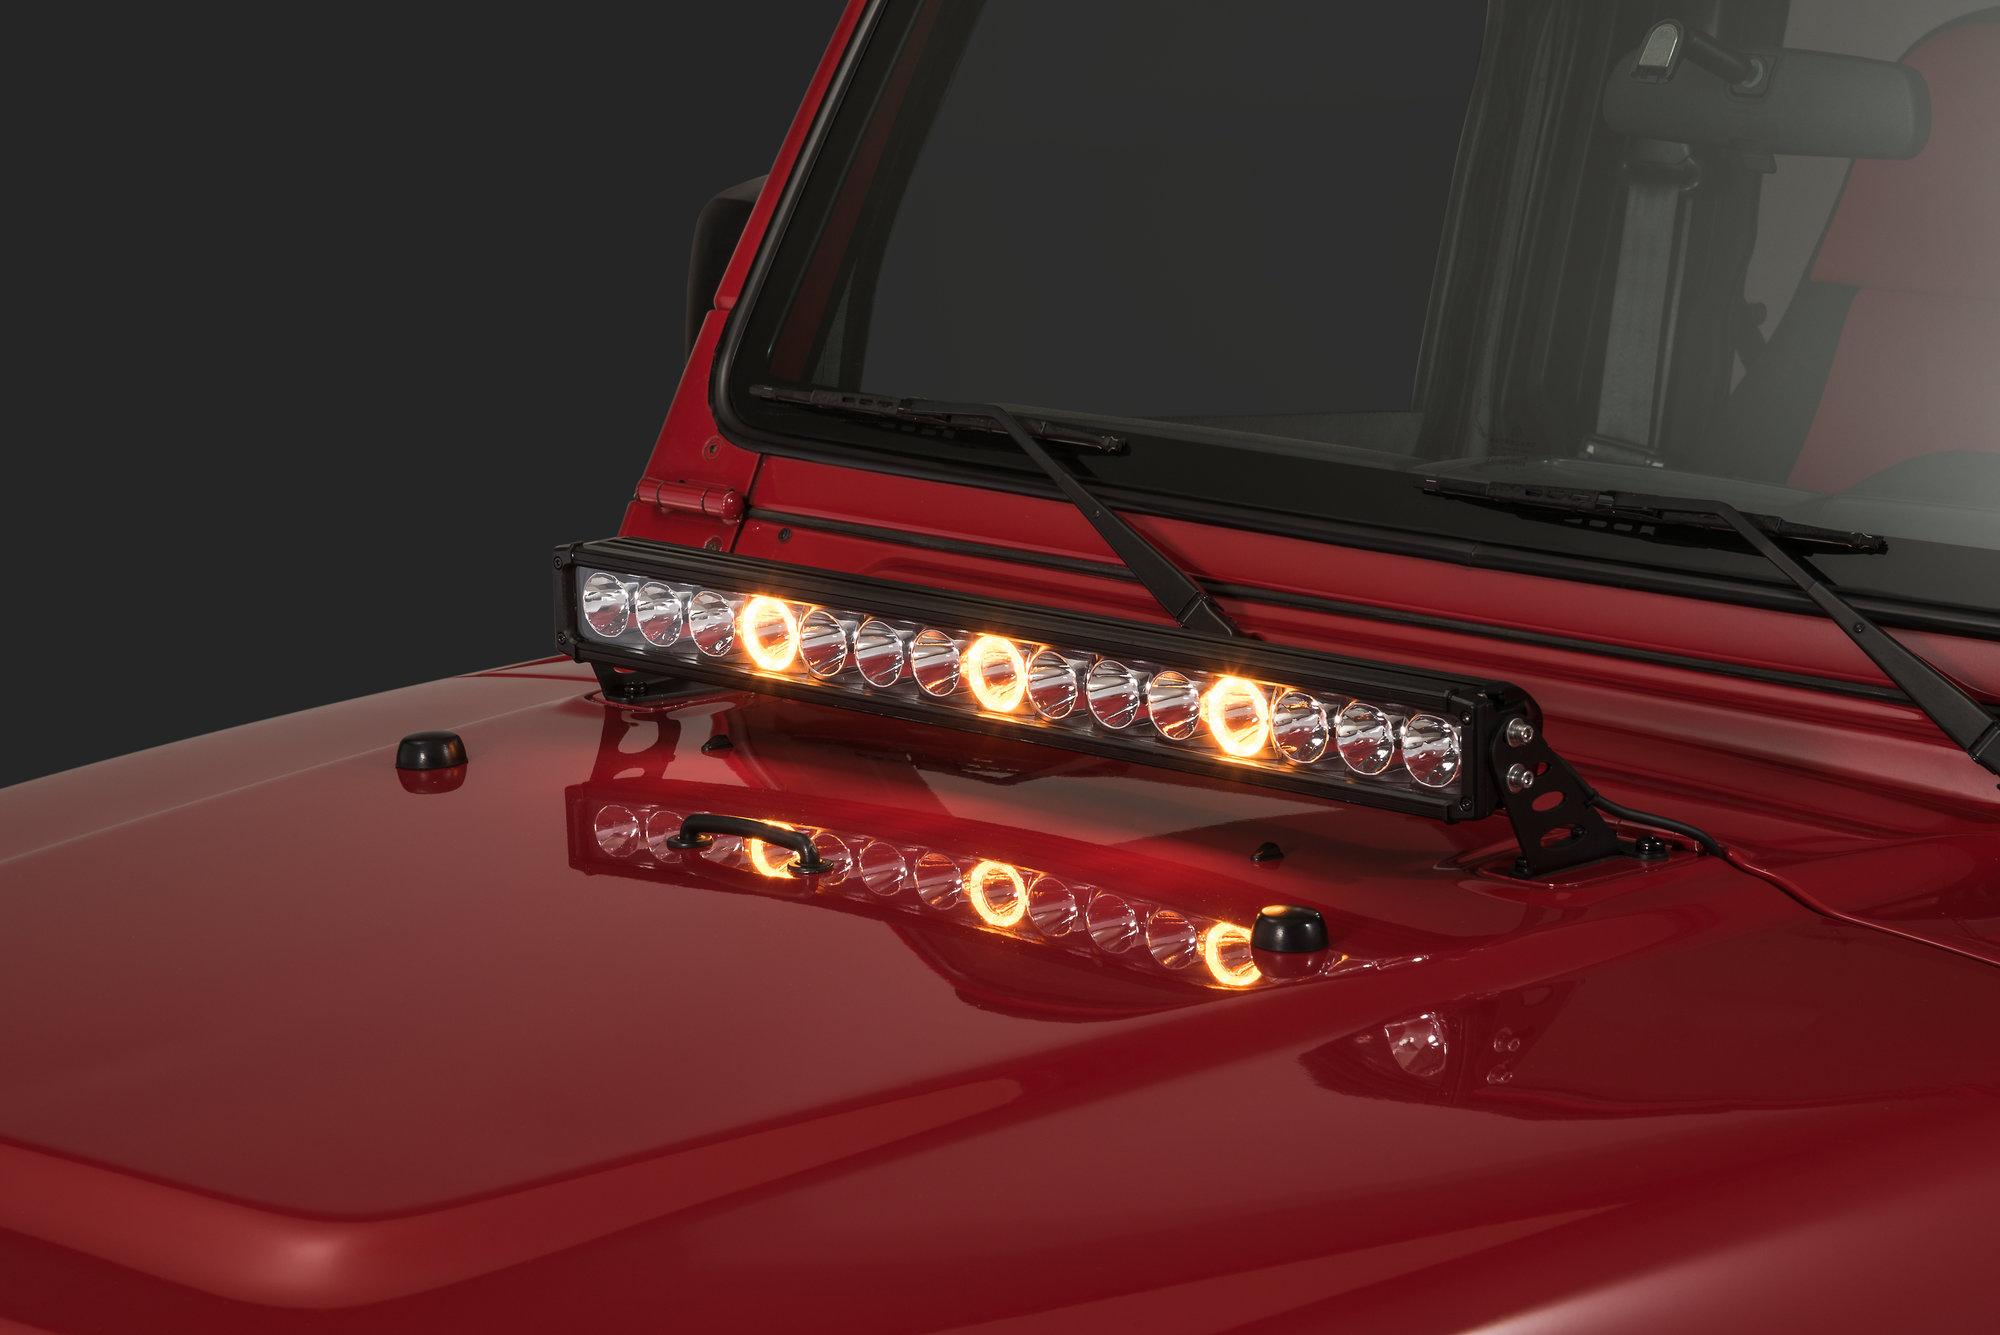 2001 Jeep Cherokee Wiring Hot